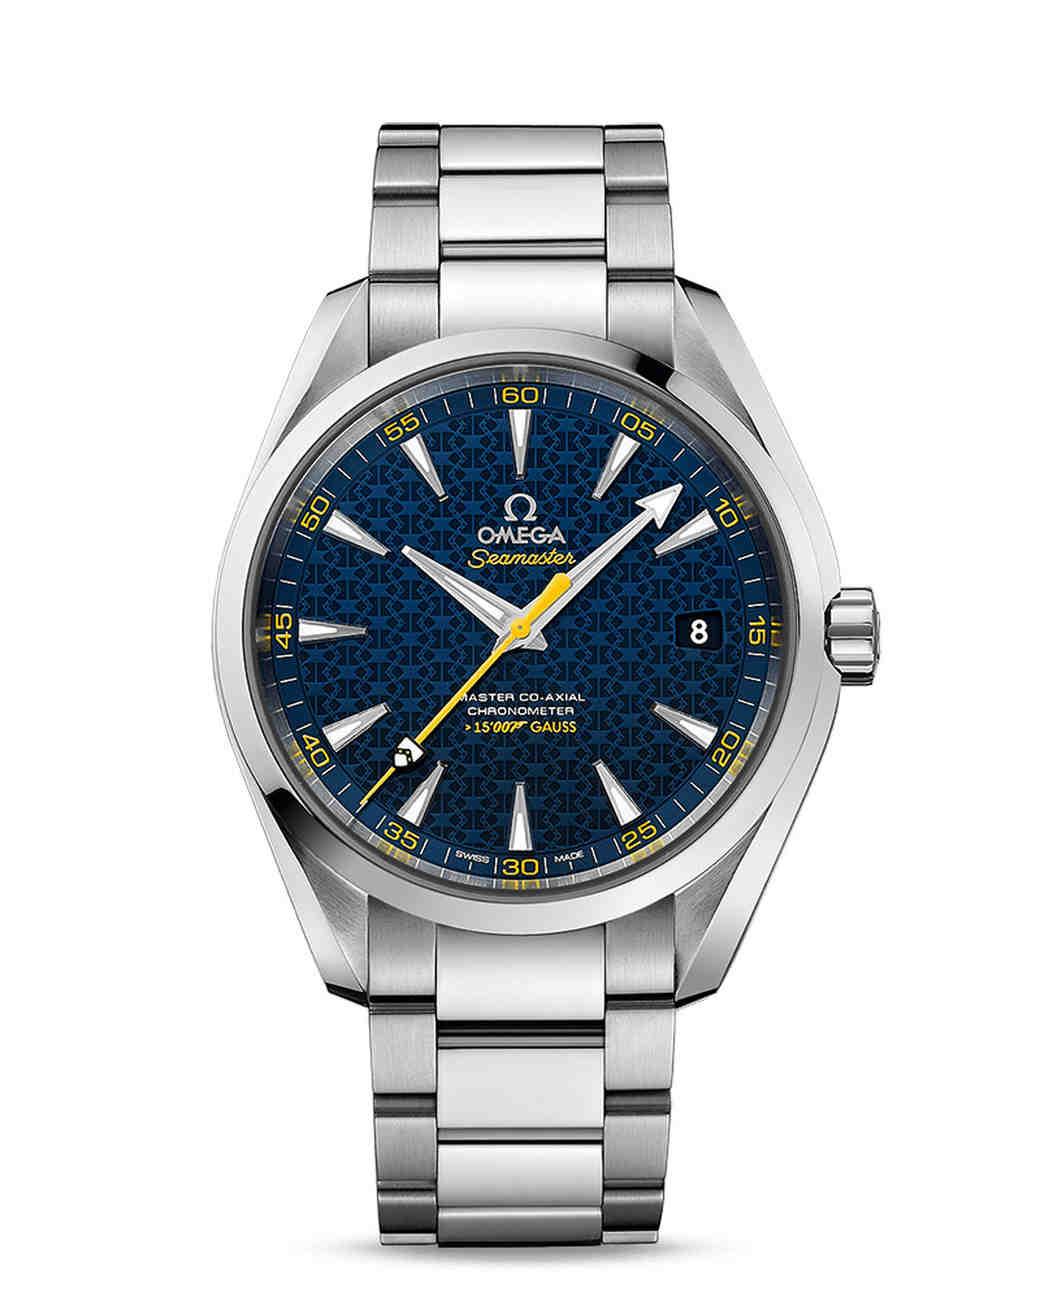 Omega Seamaster Aqua Terra Master Co-Axial Watch